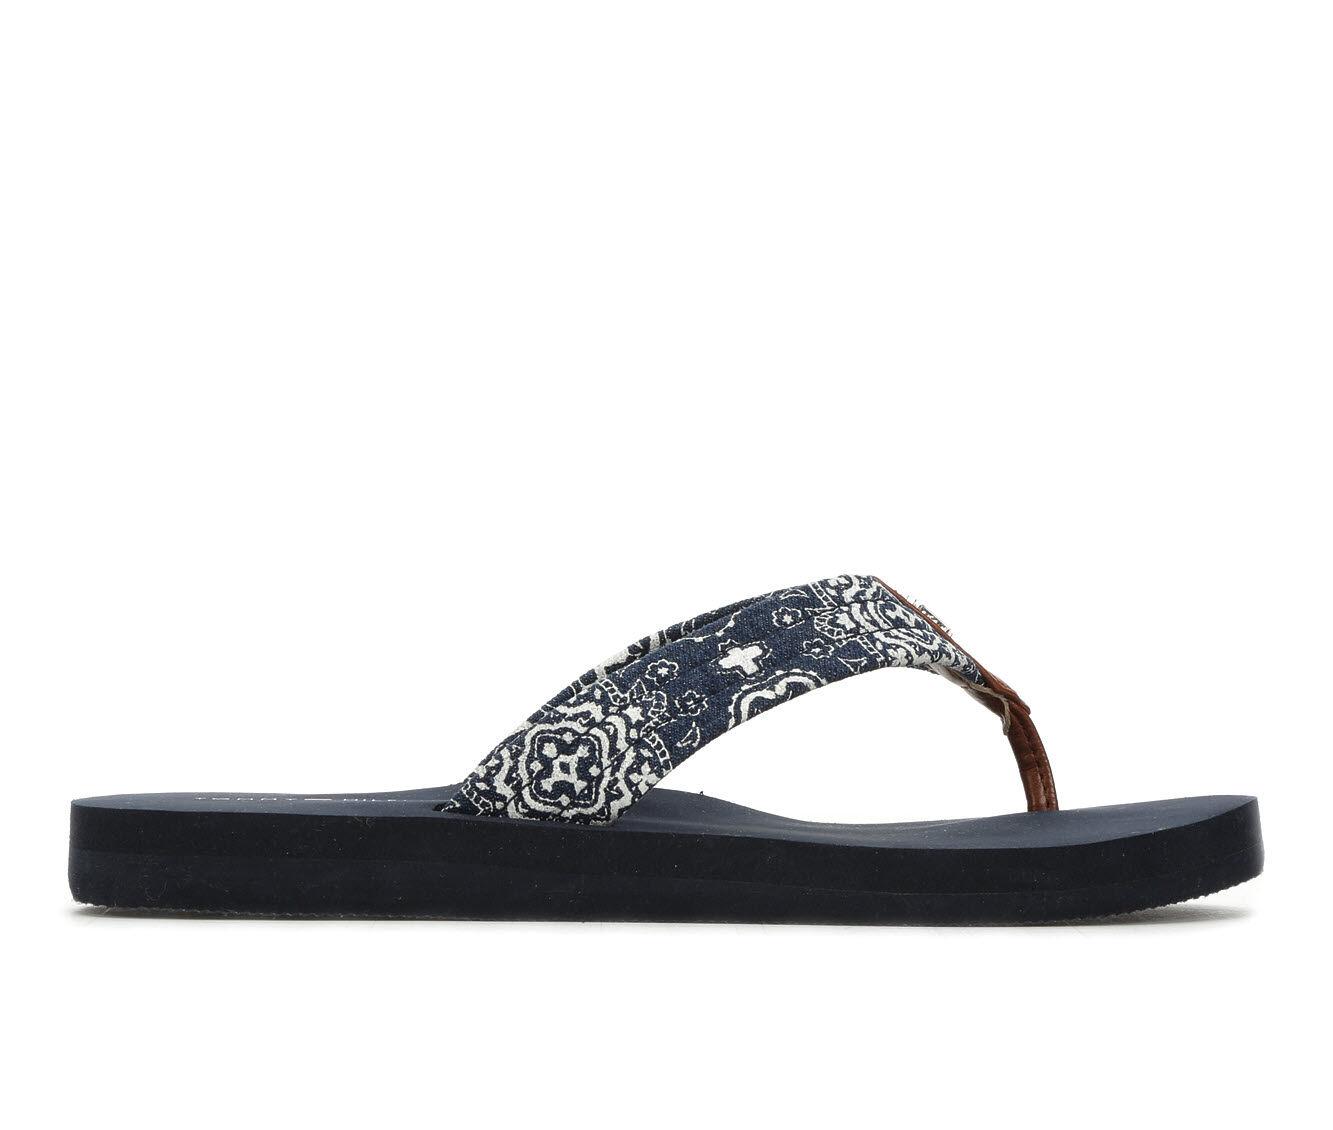 Women's Tommy Hilfiger Cart Sandals Blue/Silver